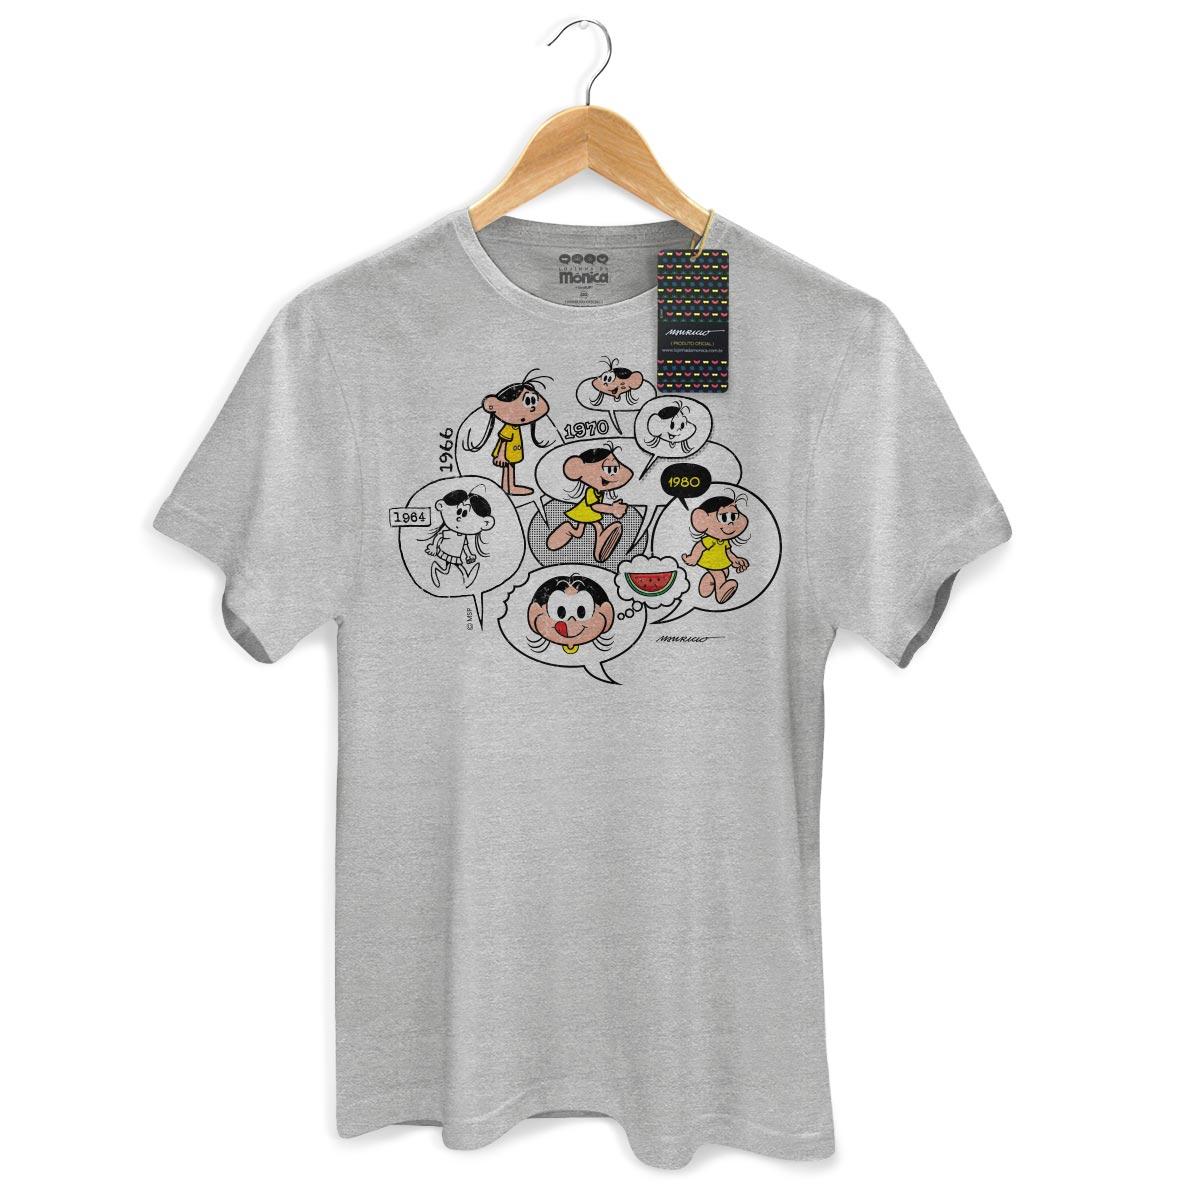 Camiseta Masculina Magali 50 Anos Since 1964